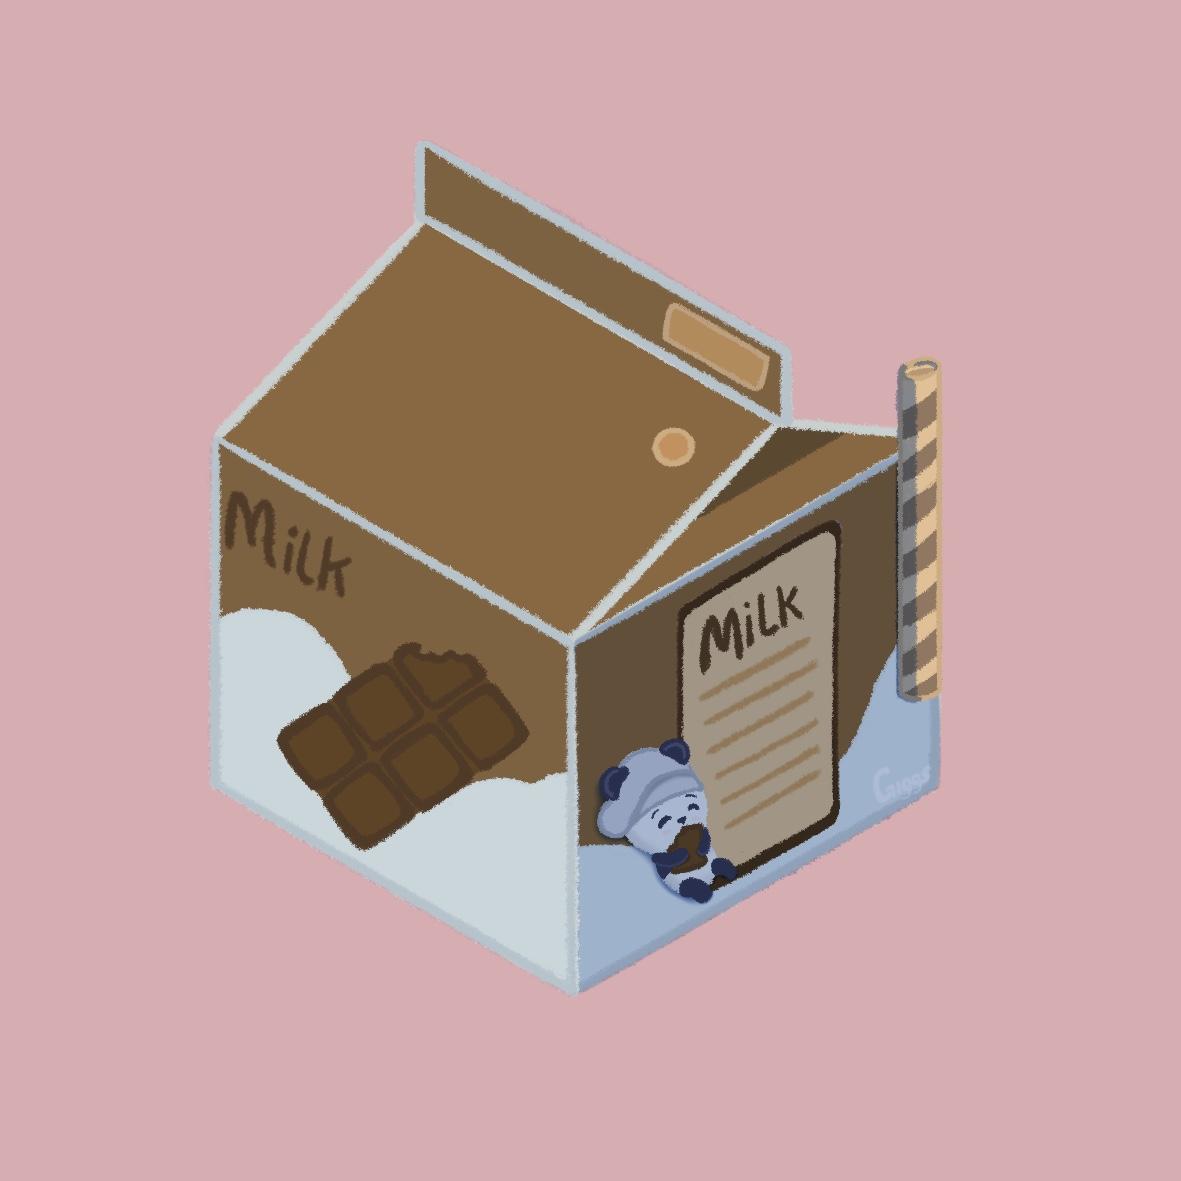 Day 70 of 100: Carton (Version 2)